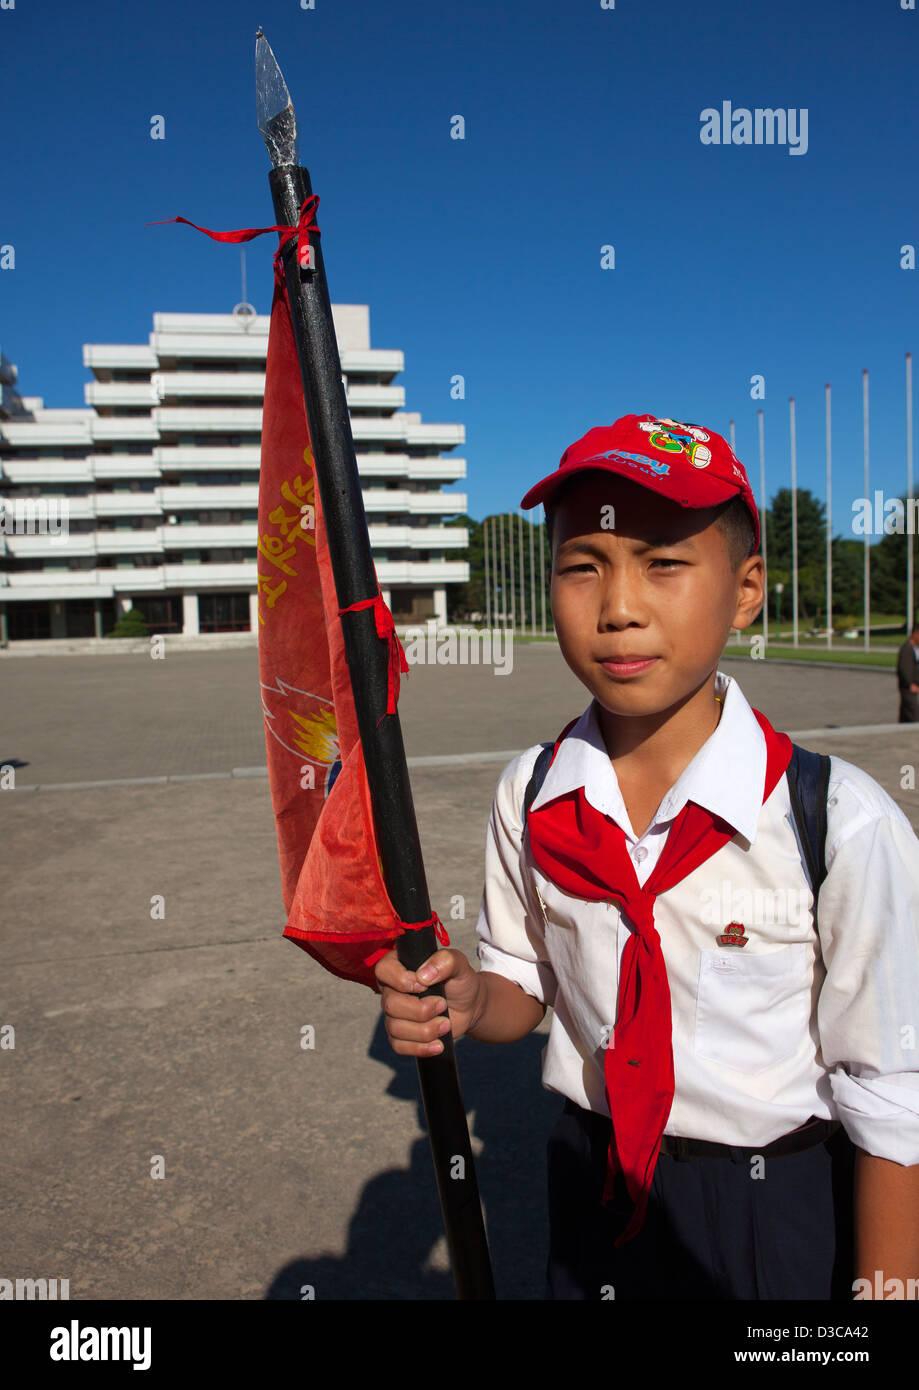 Pioneer Holding A Flag At Songdowon International Children's Camp, Wonsan, North Korea, North Korea - Stock Image